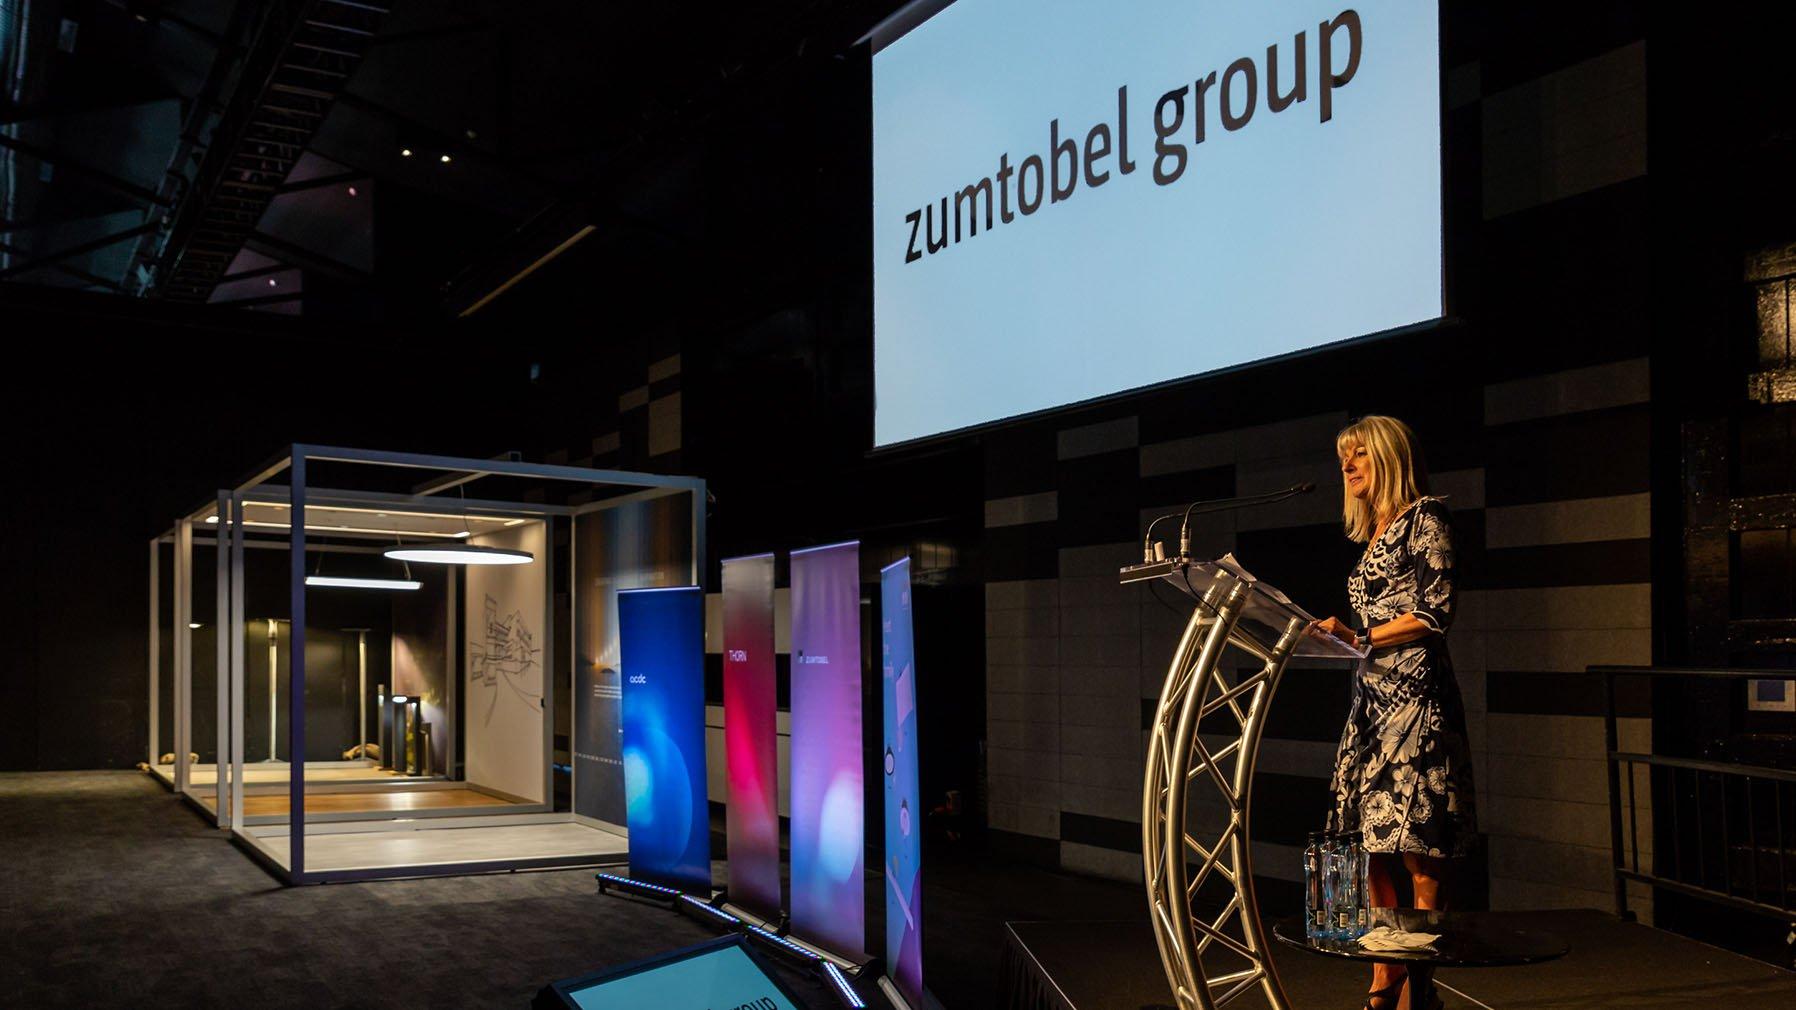 Zumtobel_Melb Conference Event